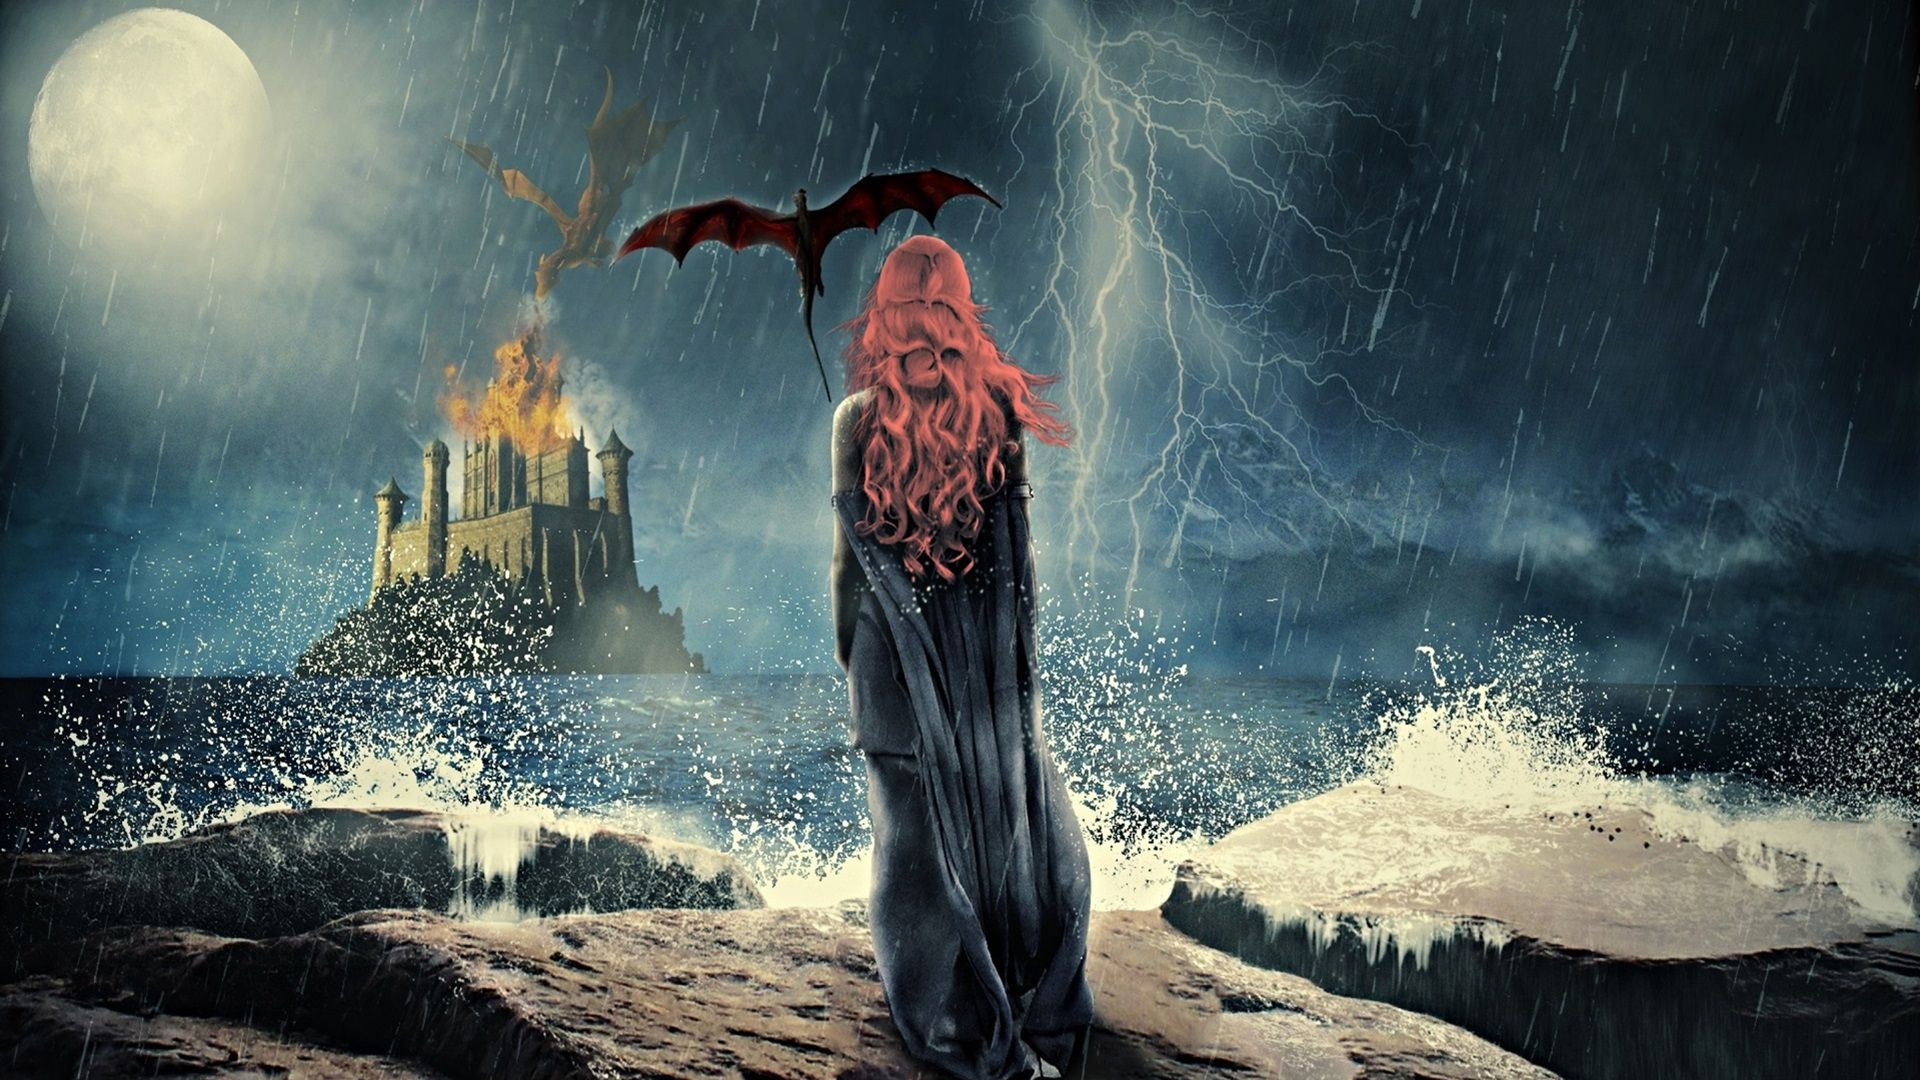 Game of Thrones Daenerys, rain